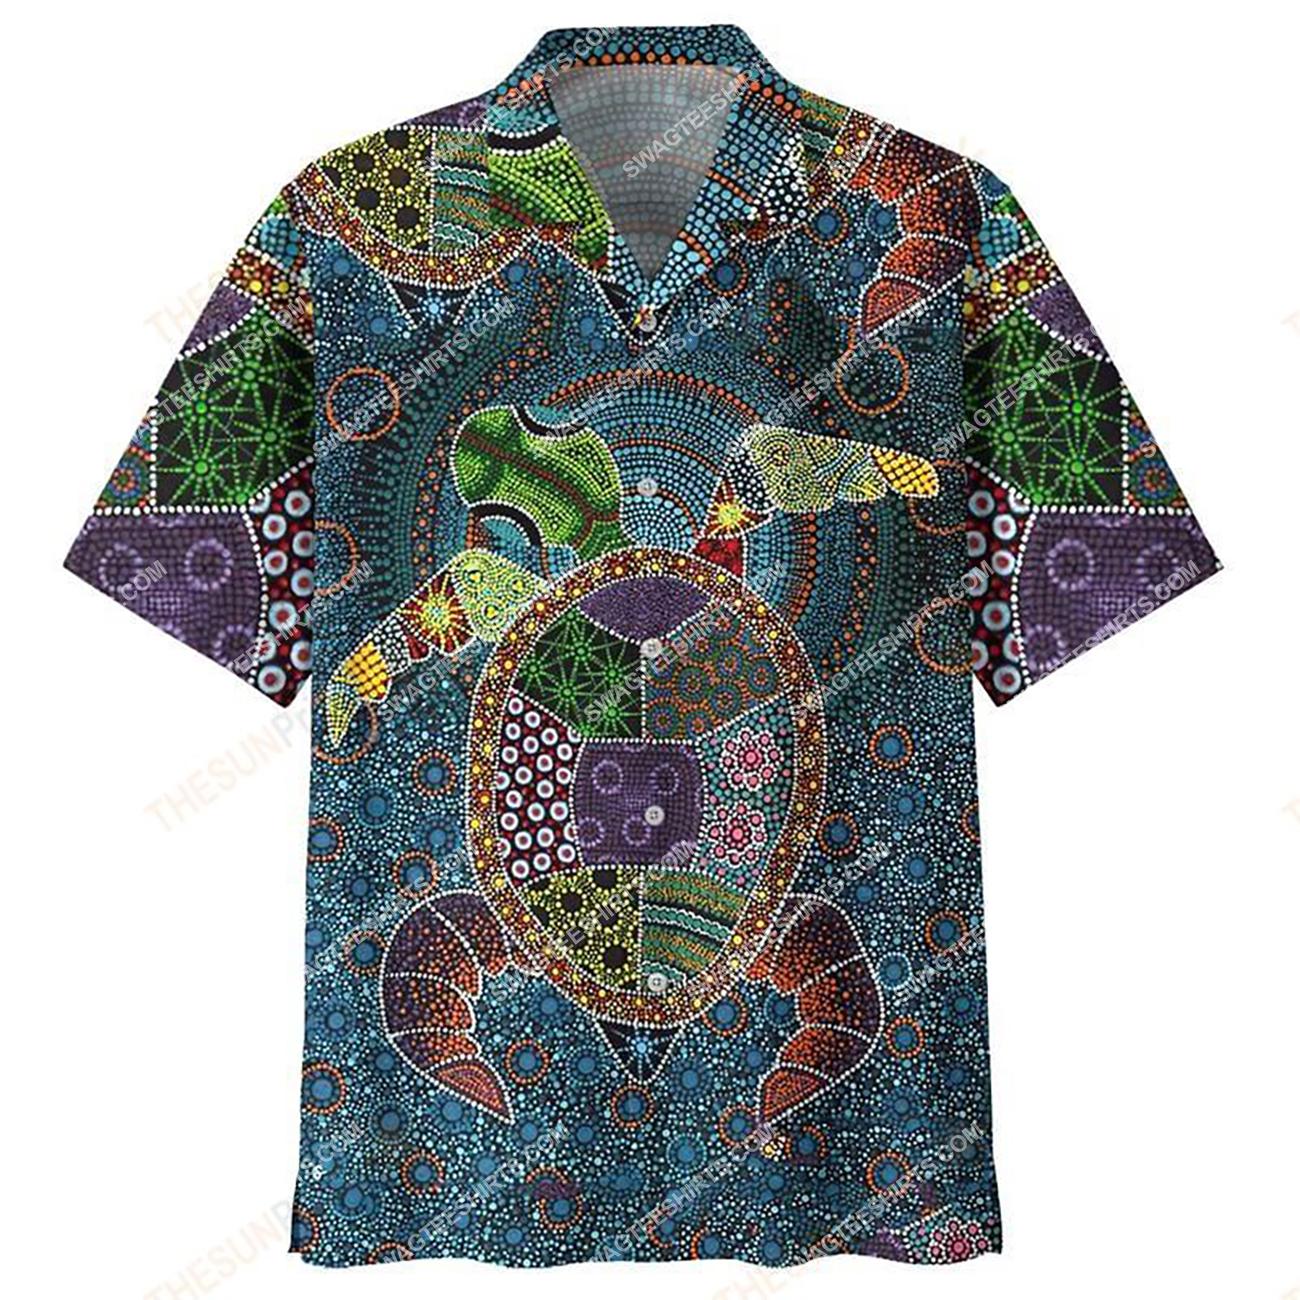 vintage sea turtle all over printed hawaiian shirt 1(1) - Copy